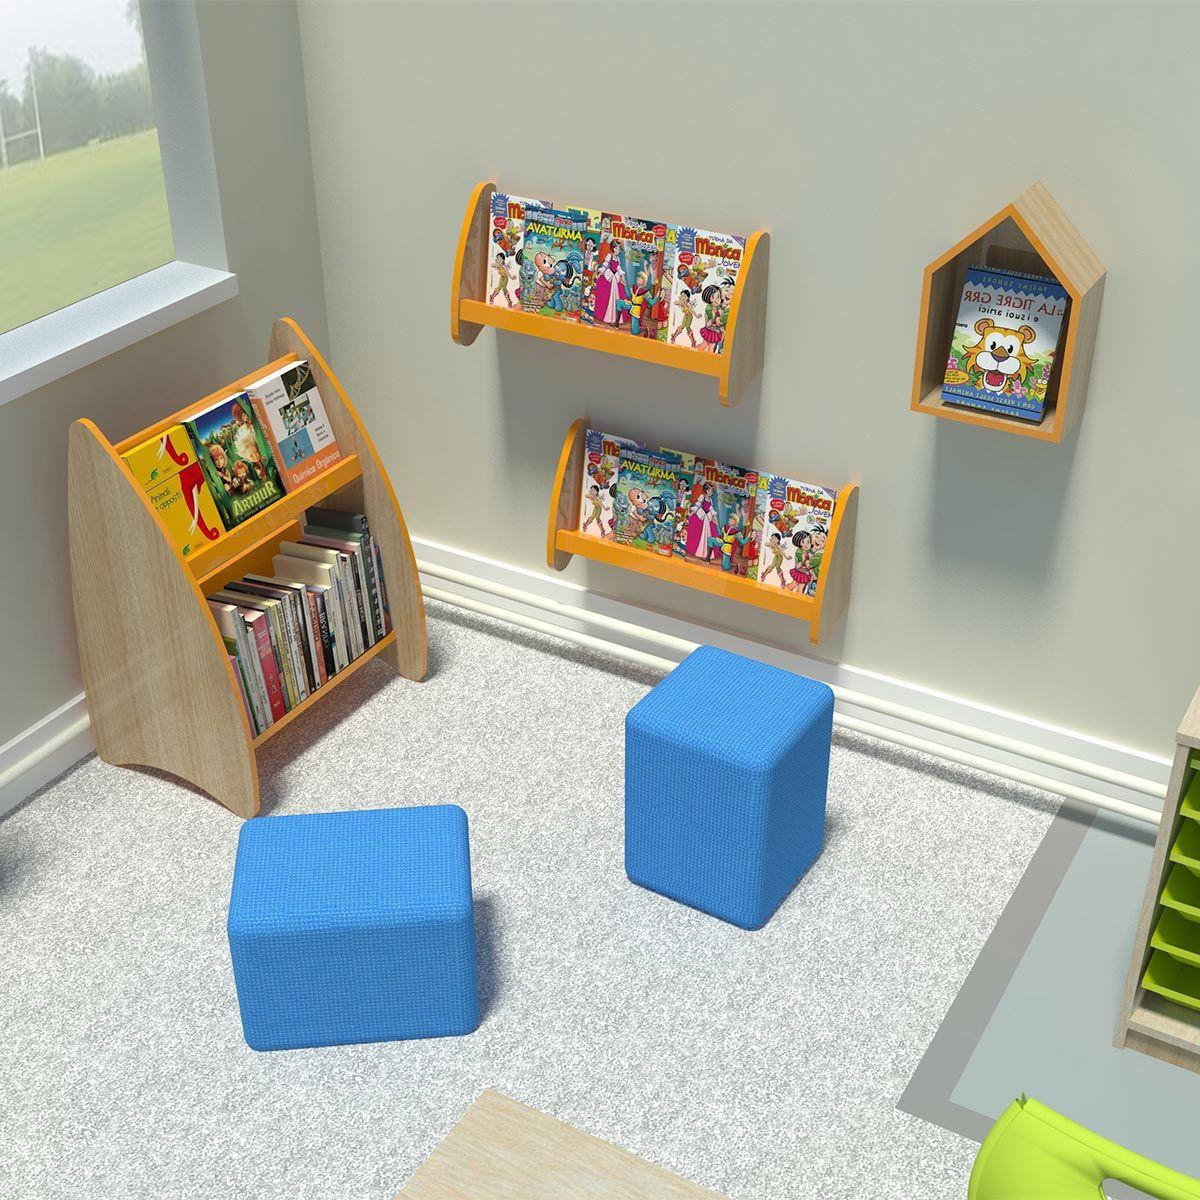 Exceptionnel Reading Corner Furniture / Story Corner Furniture For Key Stage 1